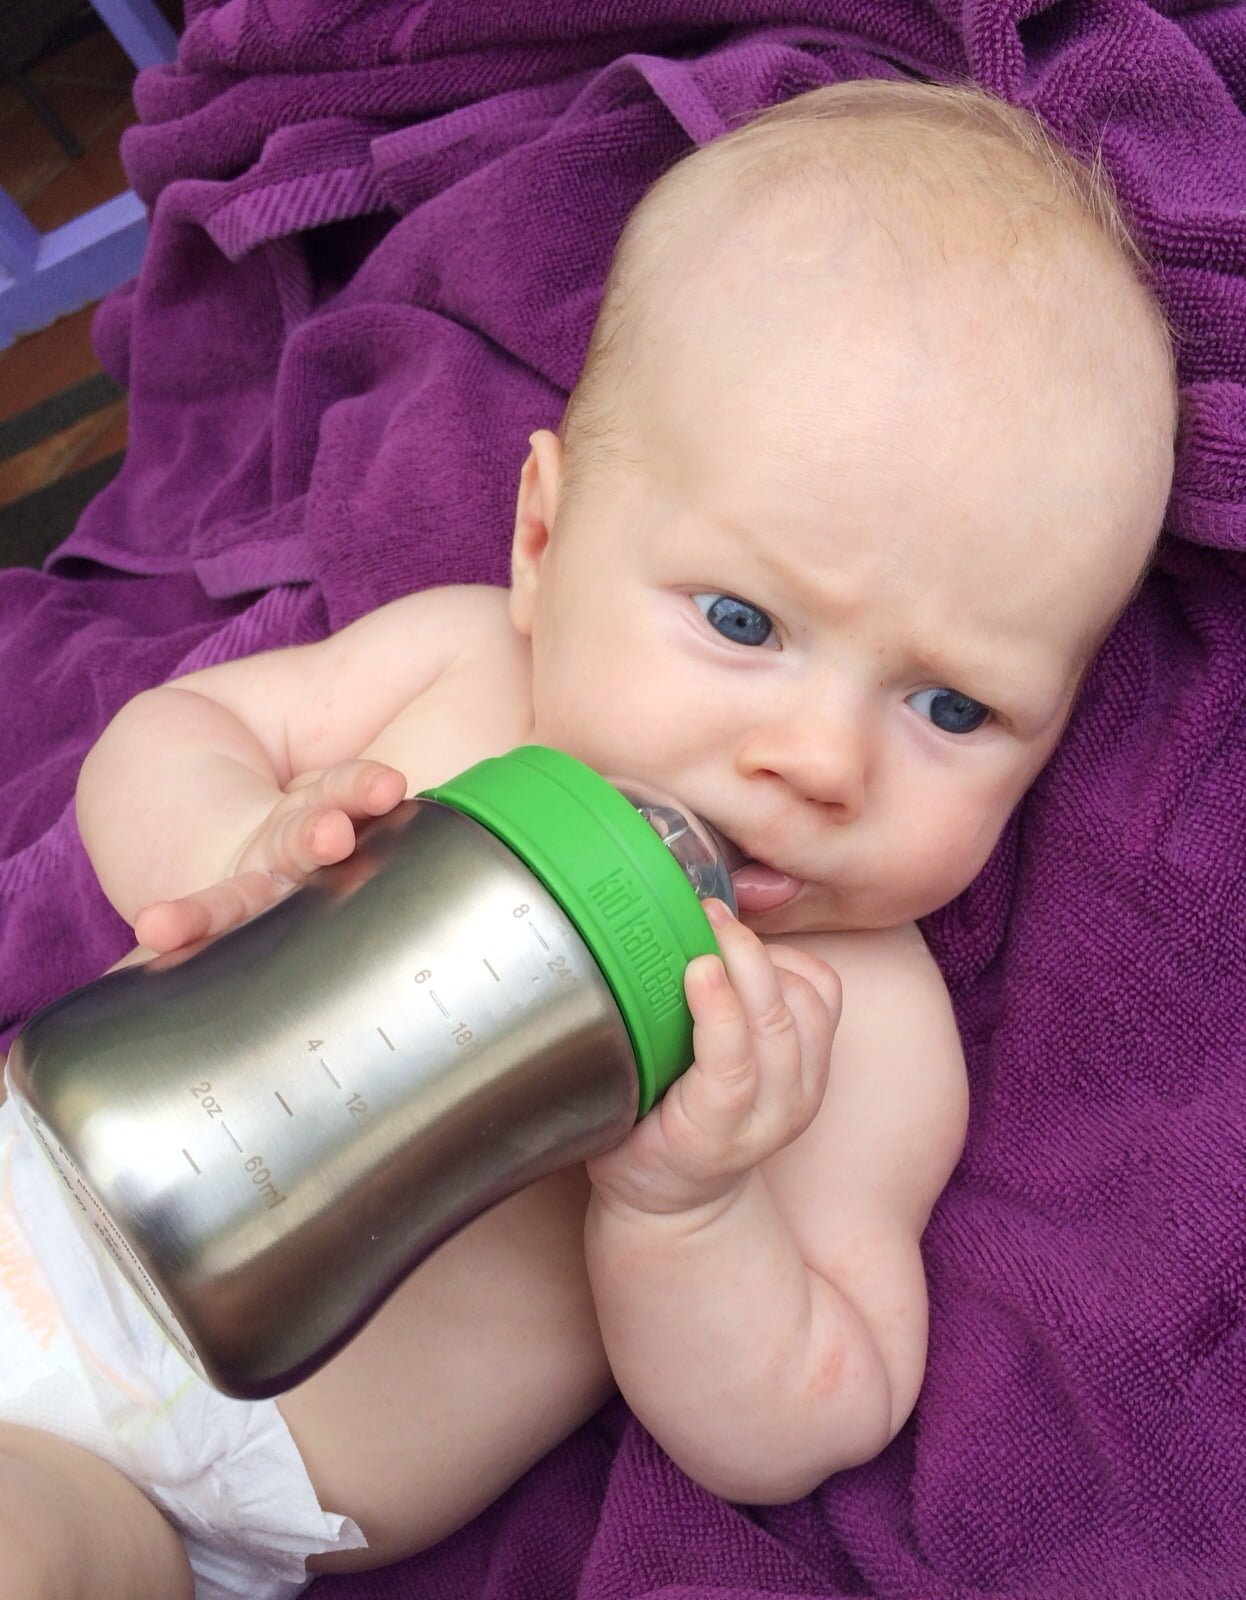 resa med bebis archives - ceciliafolkesson.se – naturlig mat & hälsa